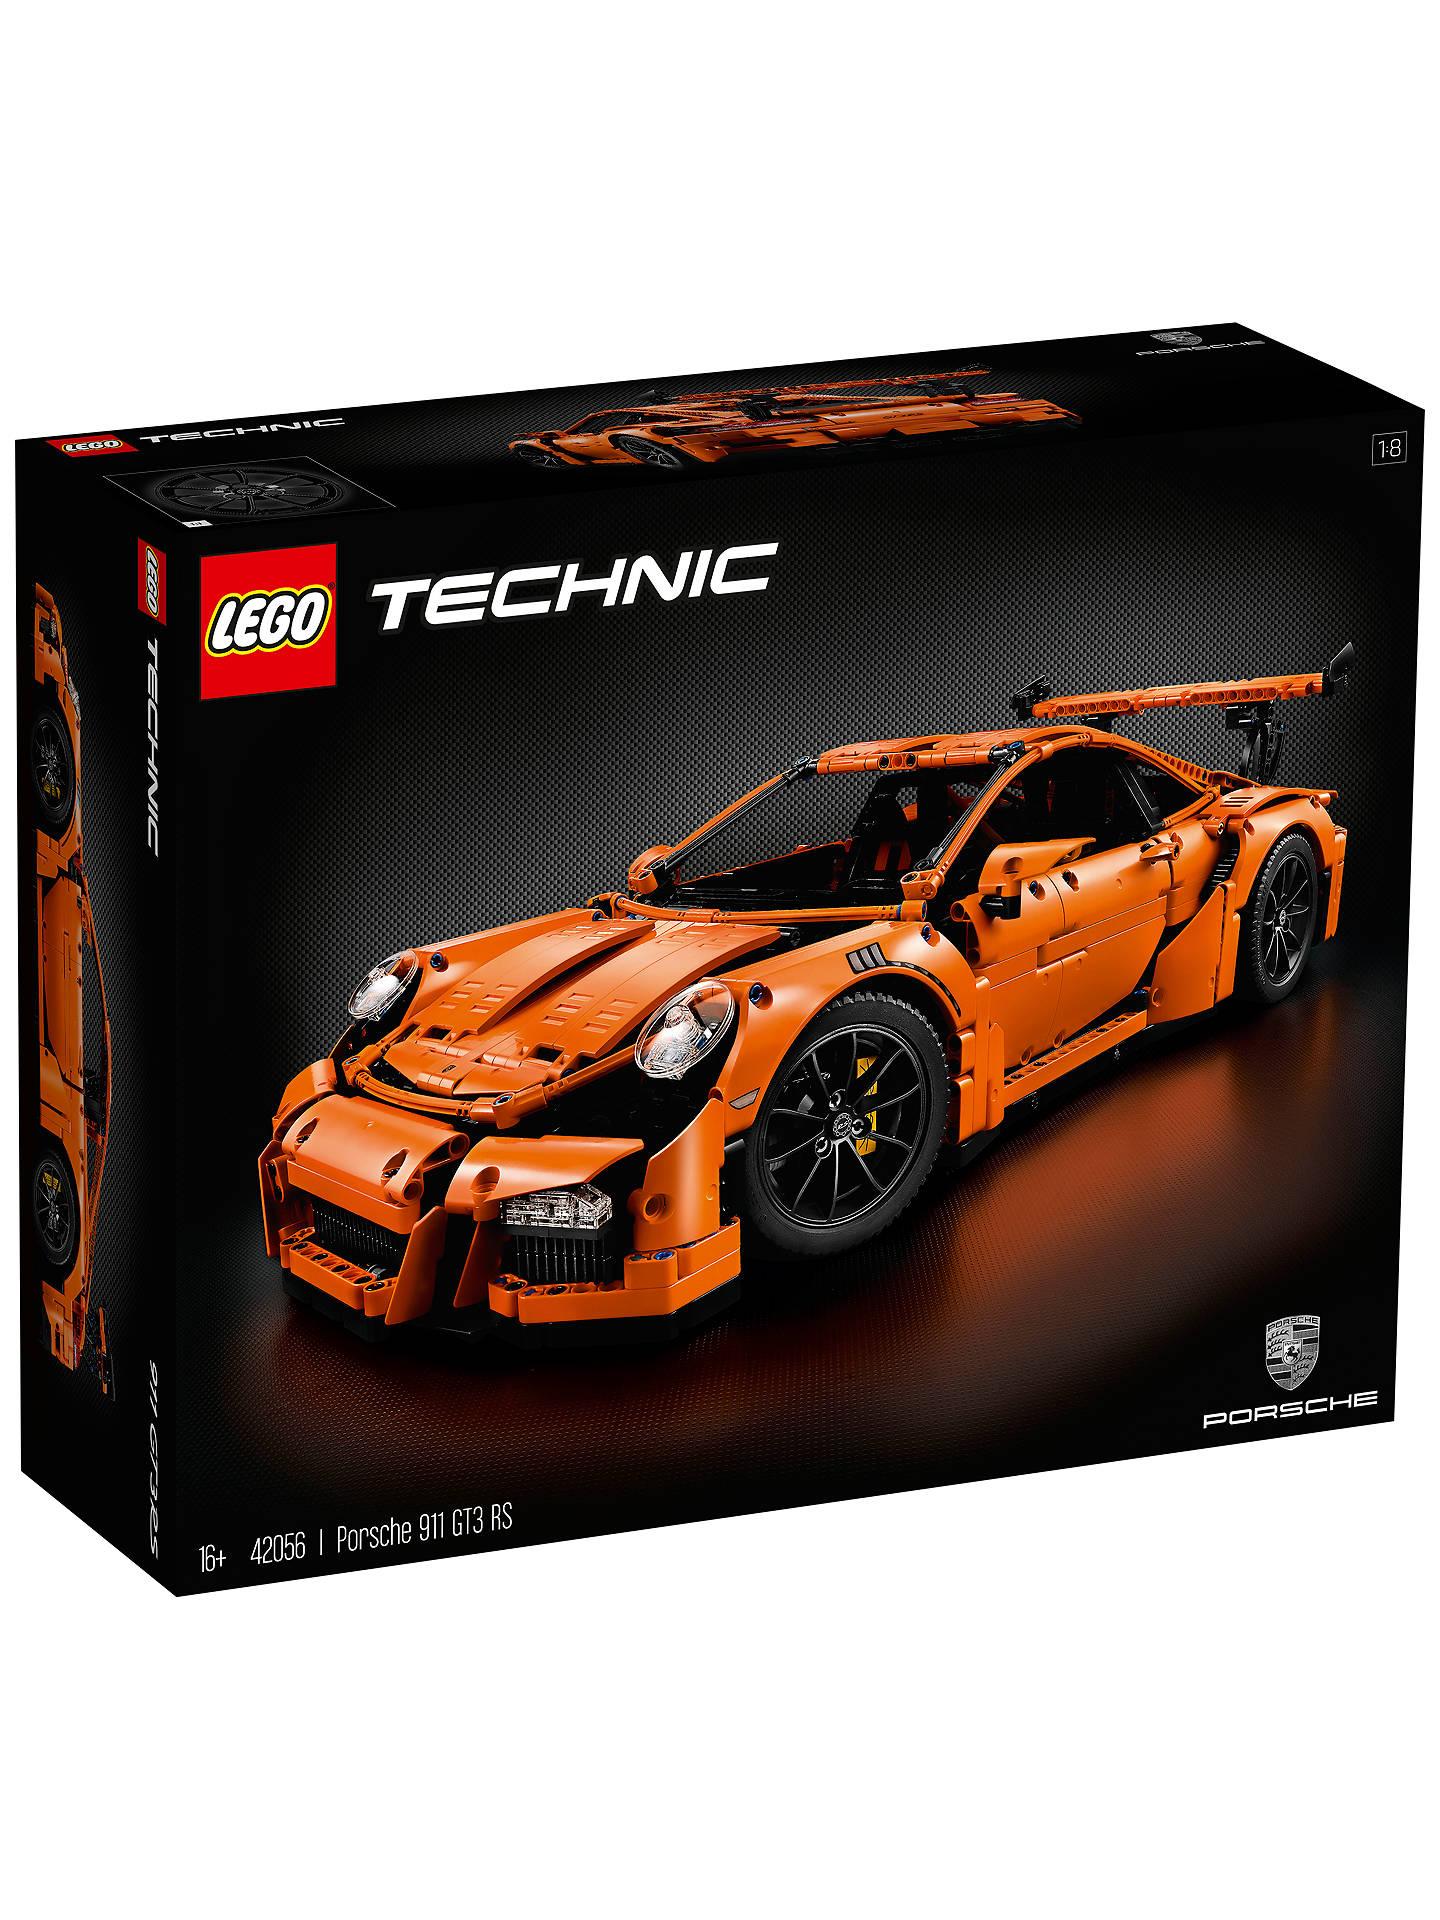 lego technic 42056 porsche 911 gt3 rs at john lewis partners. Black Bedroom Furniture Sets. Home Design Ideas